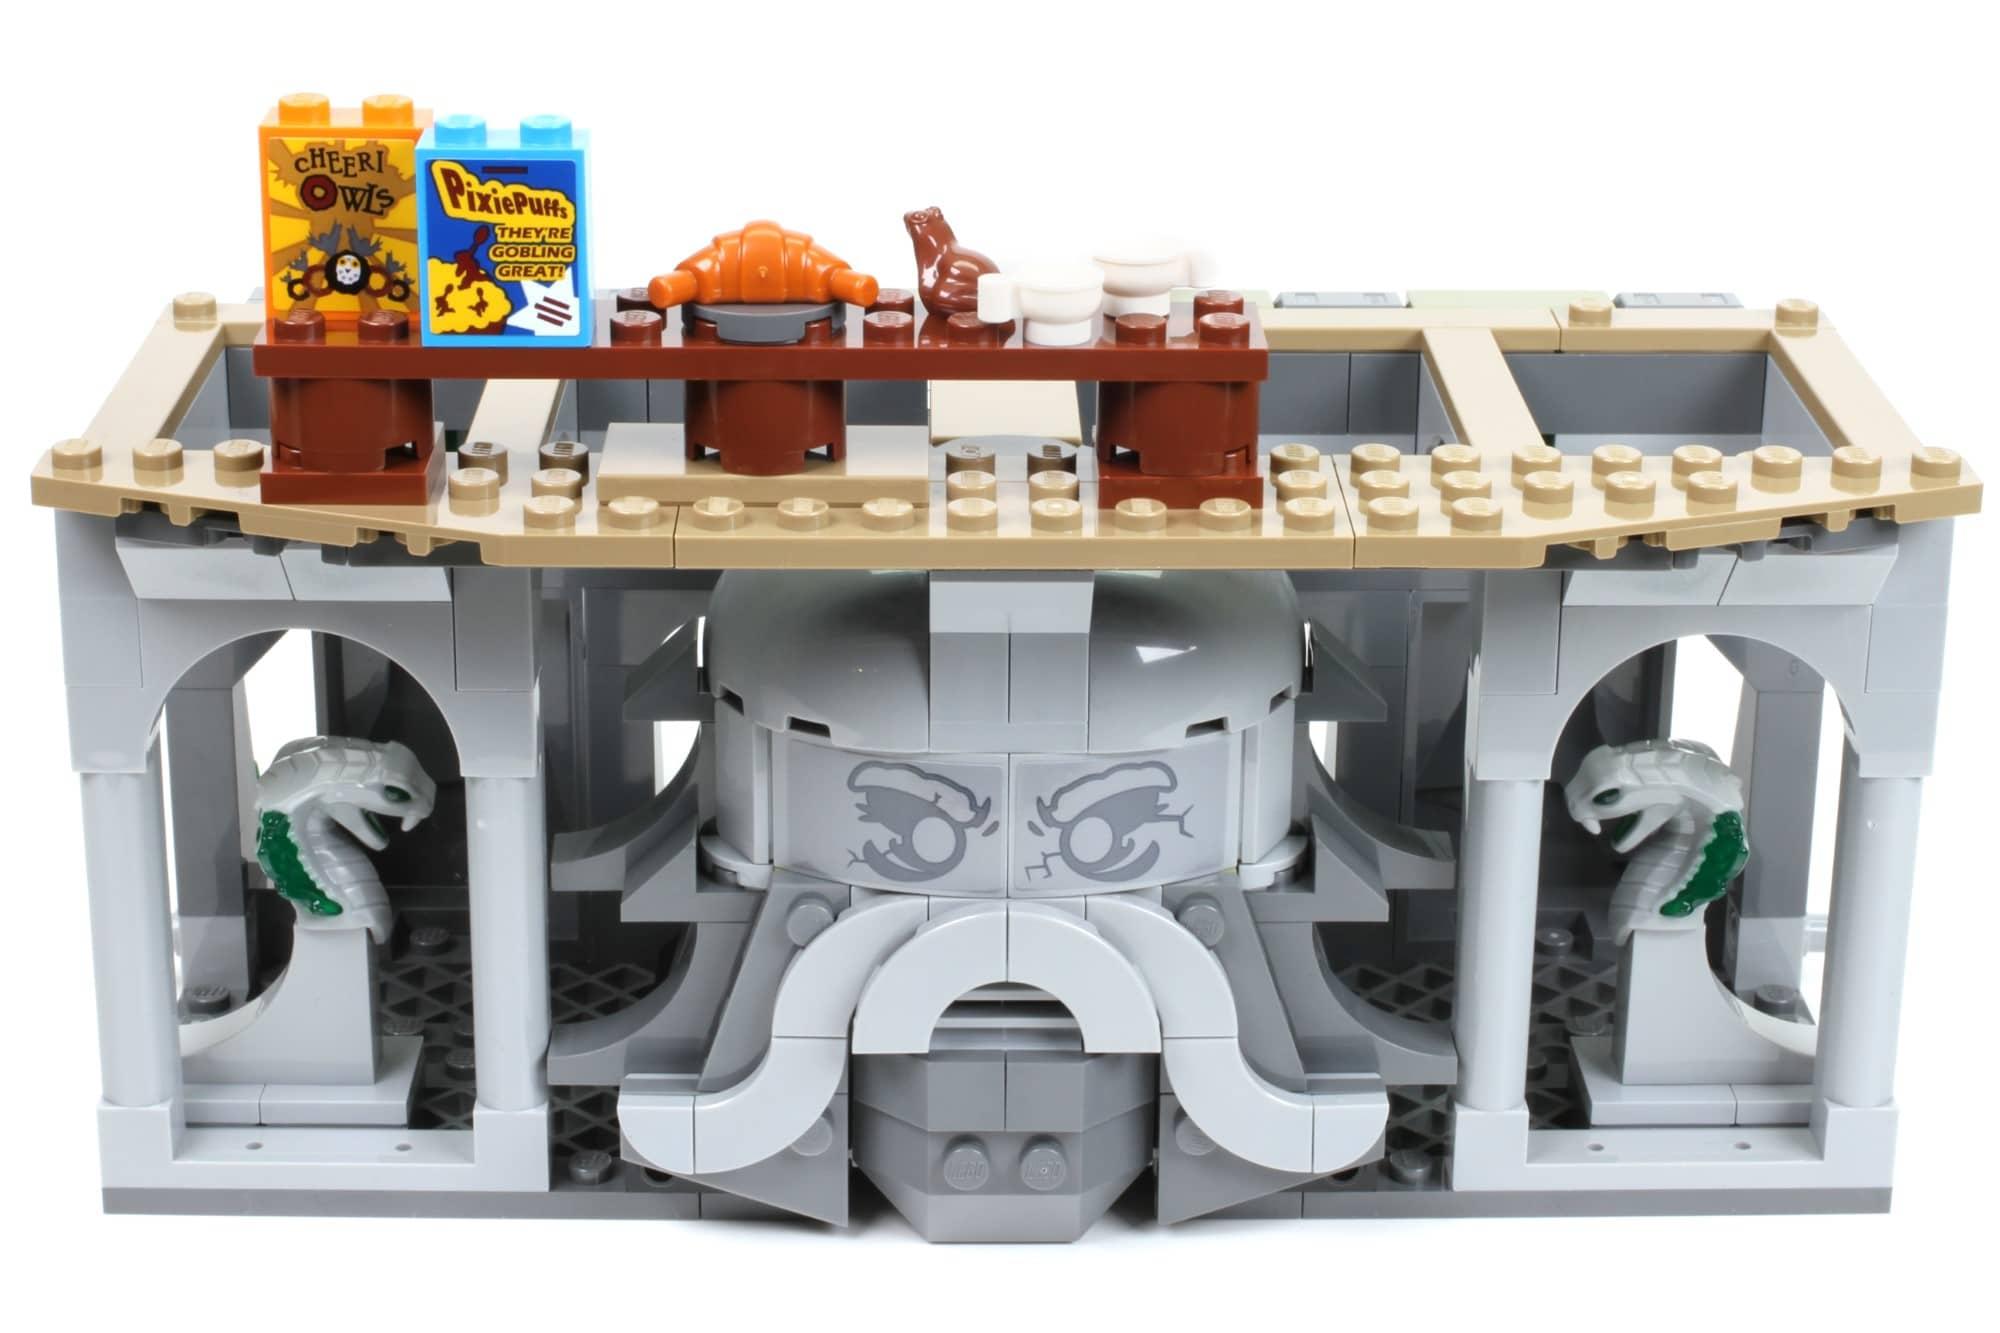 LEGO Harry Potter 76389 Hogwarts Kammer Des Schreckens Schritt 9 2